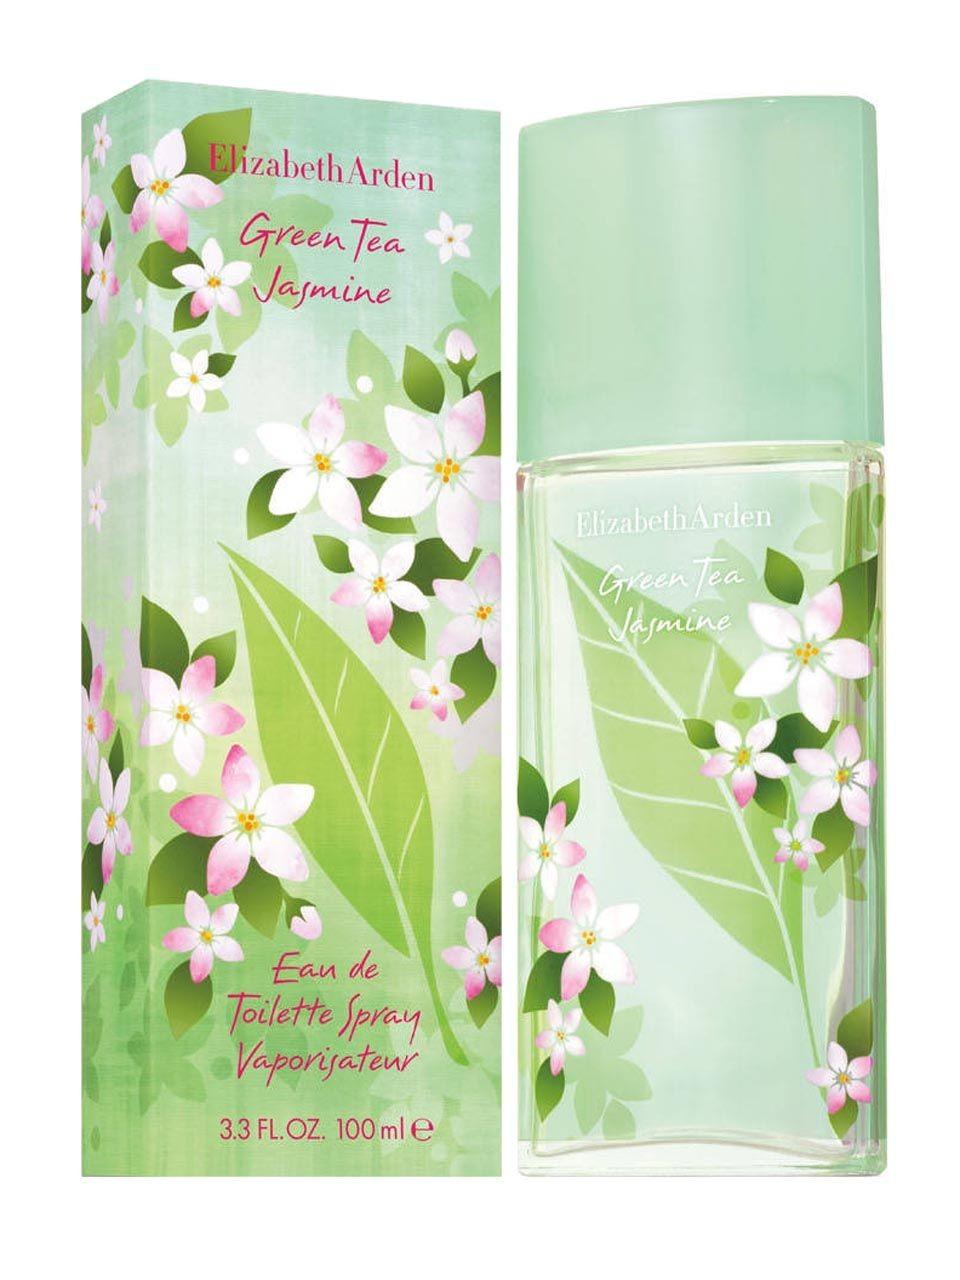 Green tea jasmine elizabeth arden perfume a new fragrance for green tea jasmine elizabeth arden for women pictures izmirmasajfo